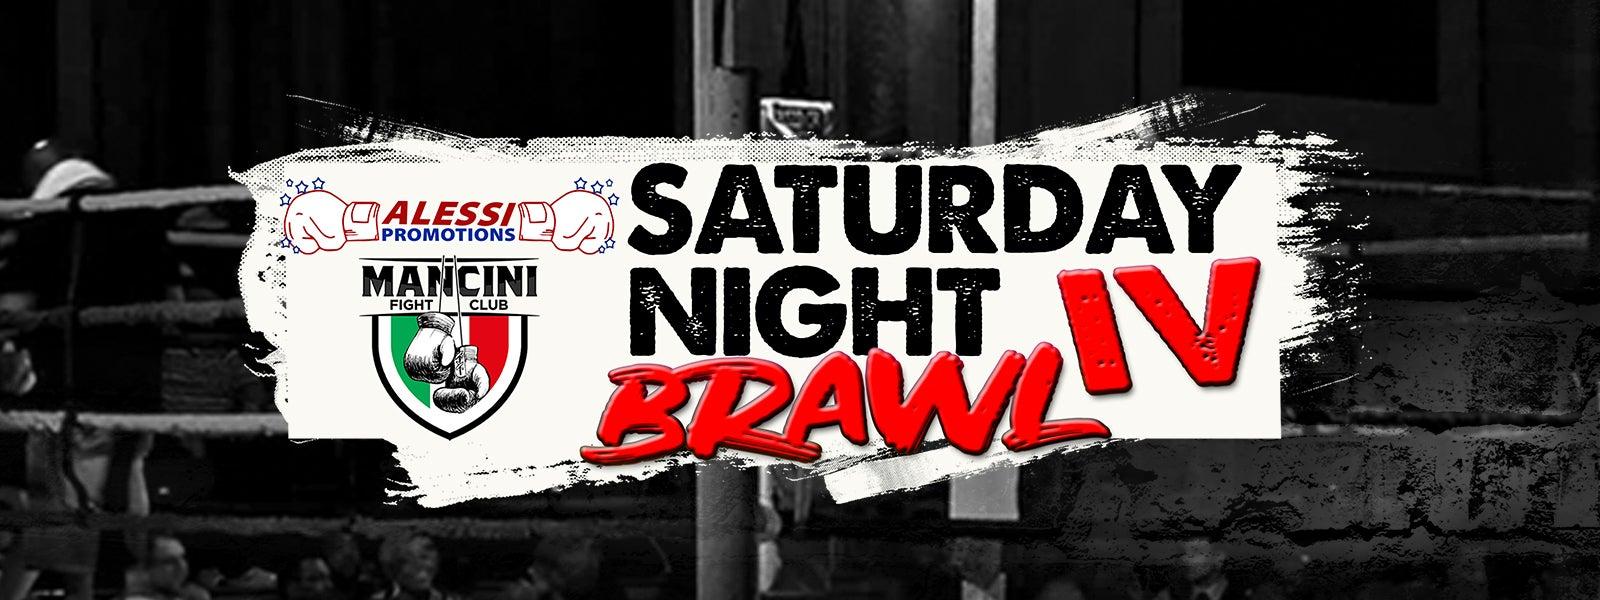 POSTPONED - Saturday Night Brawl IV